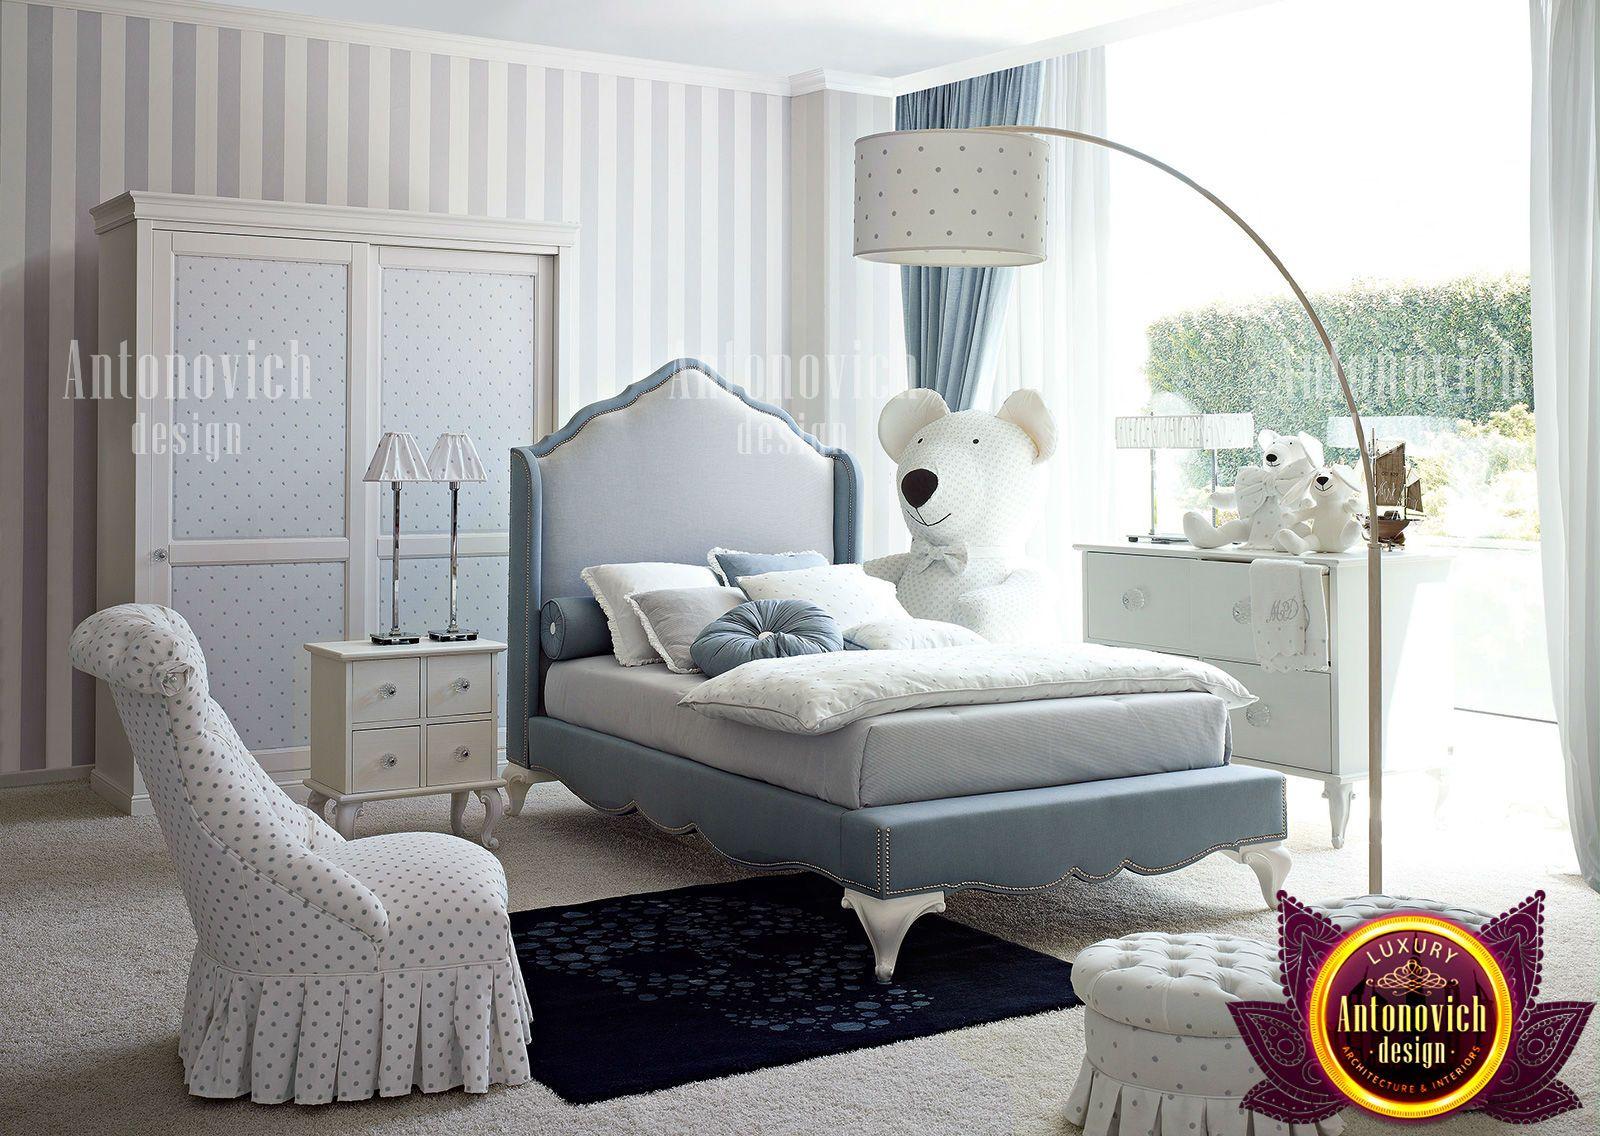 Stylish Kids Bedroom Furniture Kids Bed Design Childrens Bedrooms Design Kids Bedroom Furniture Classic bedroom for children